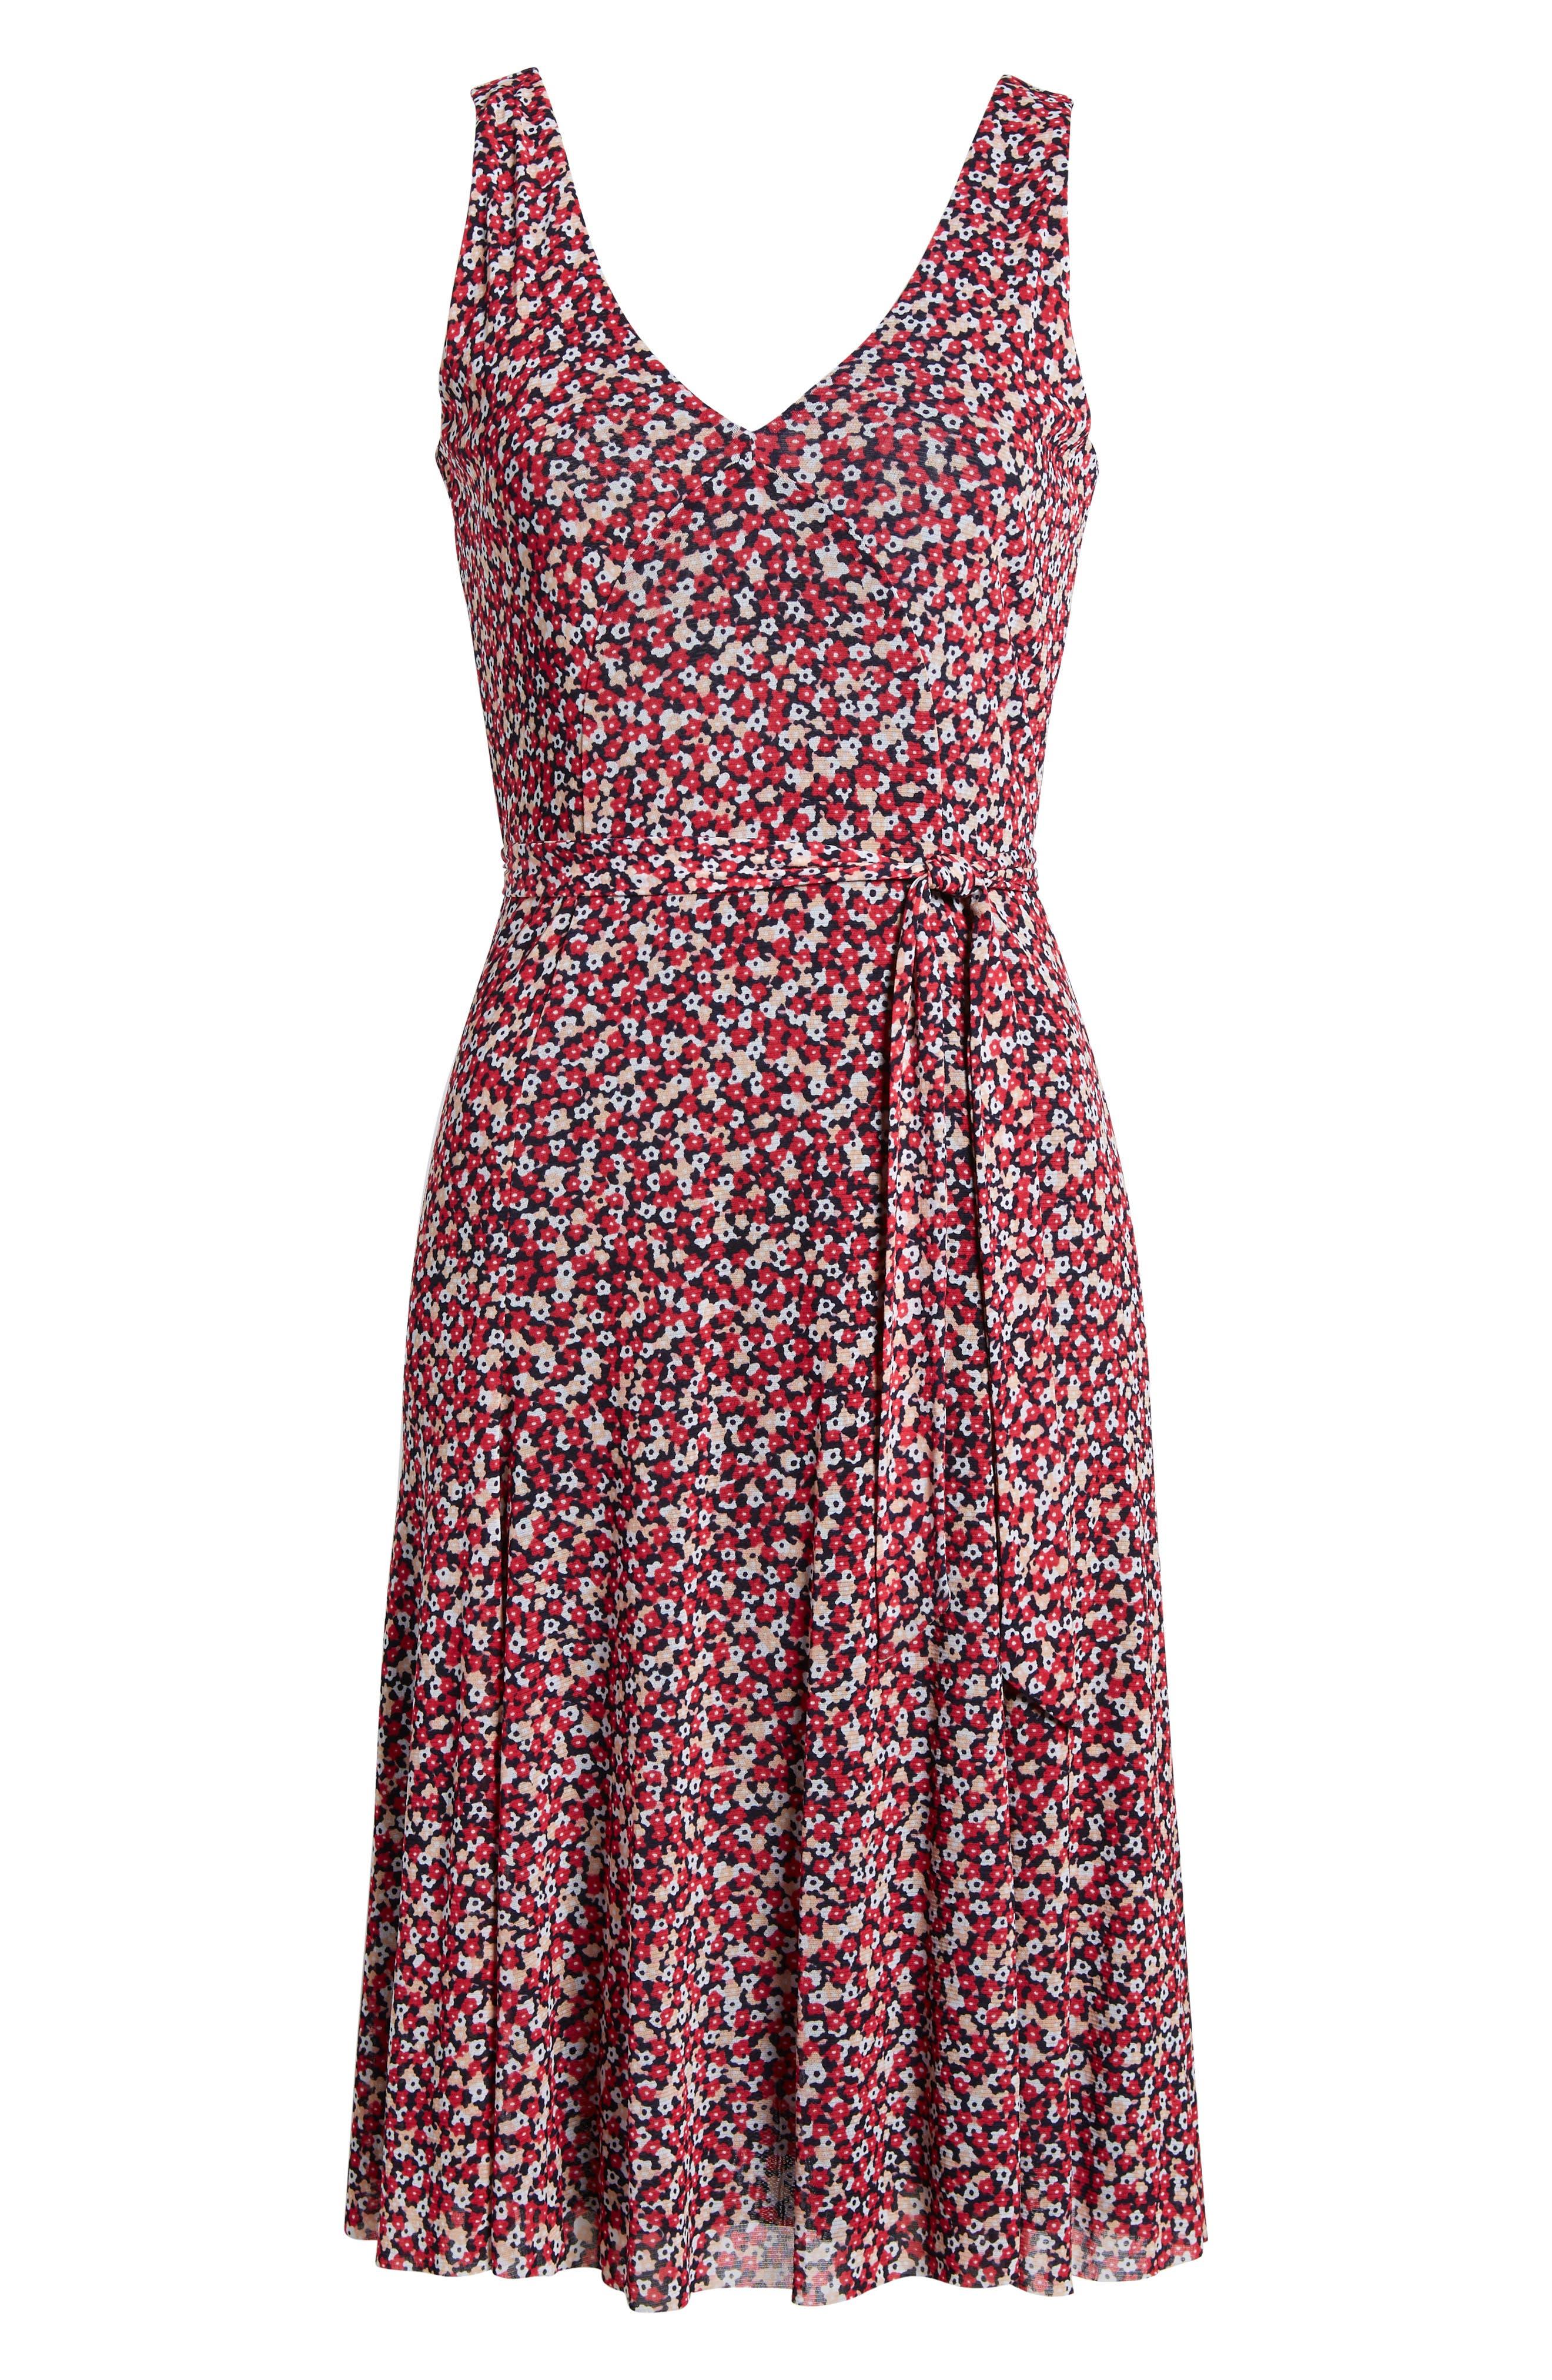 Floral Tank Dress,                             Alternate thumbnail 6, color,                             678